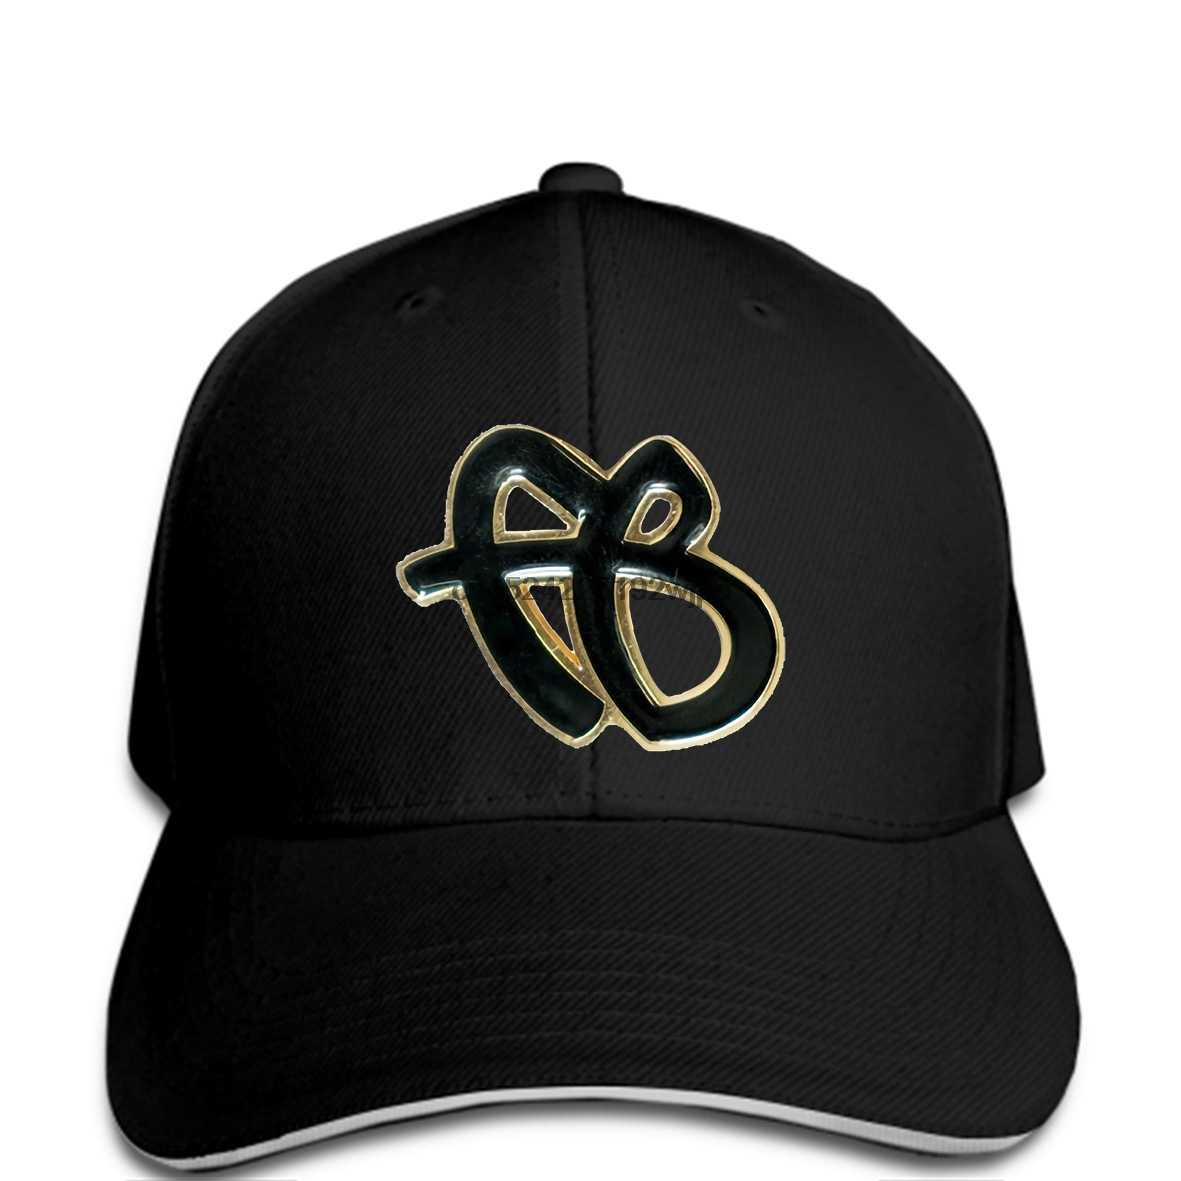 4cfa7828765b0 Detail Feedback Questions about Men Baseball cap Fubu Logo Printed Graphic  Black cap novelty cap women on Aliexpress.com